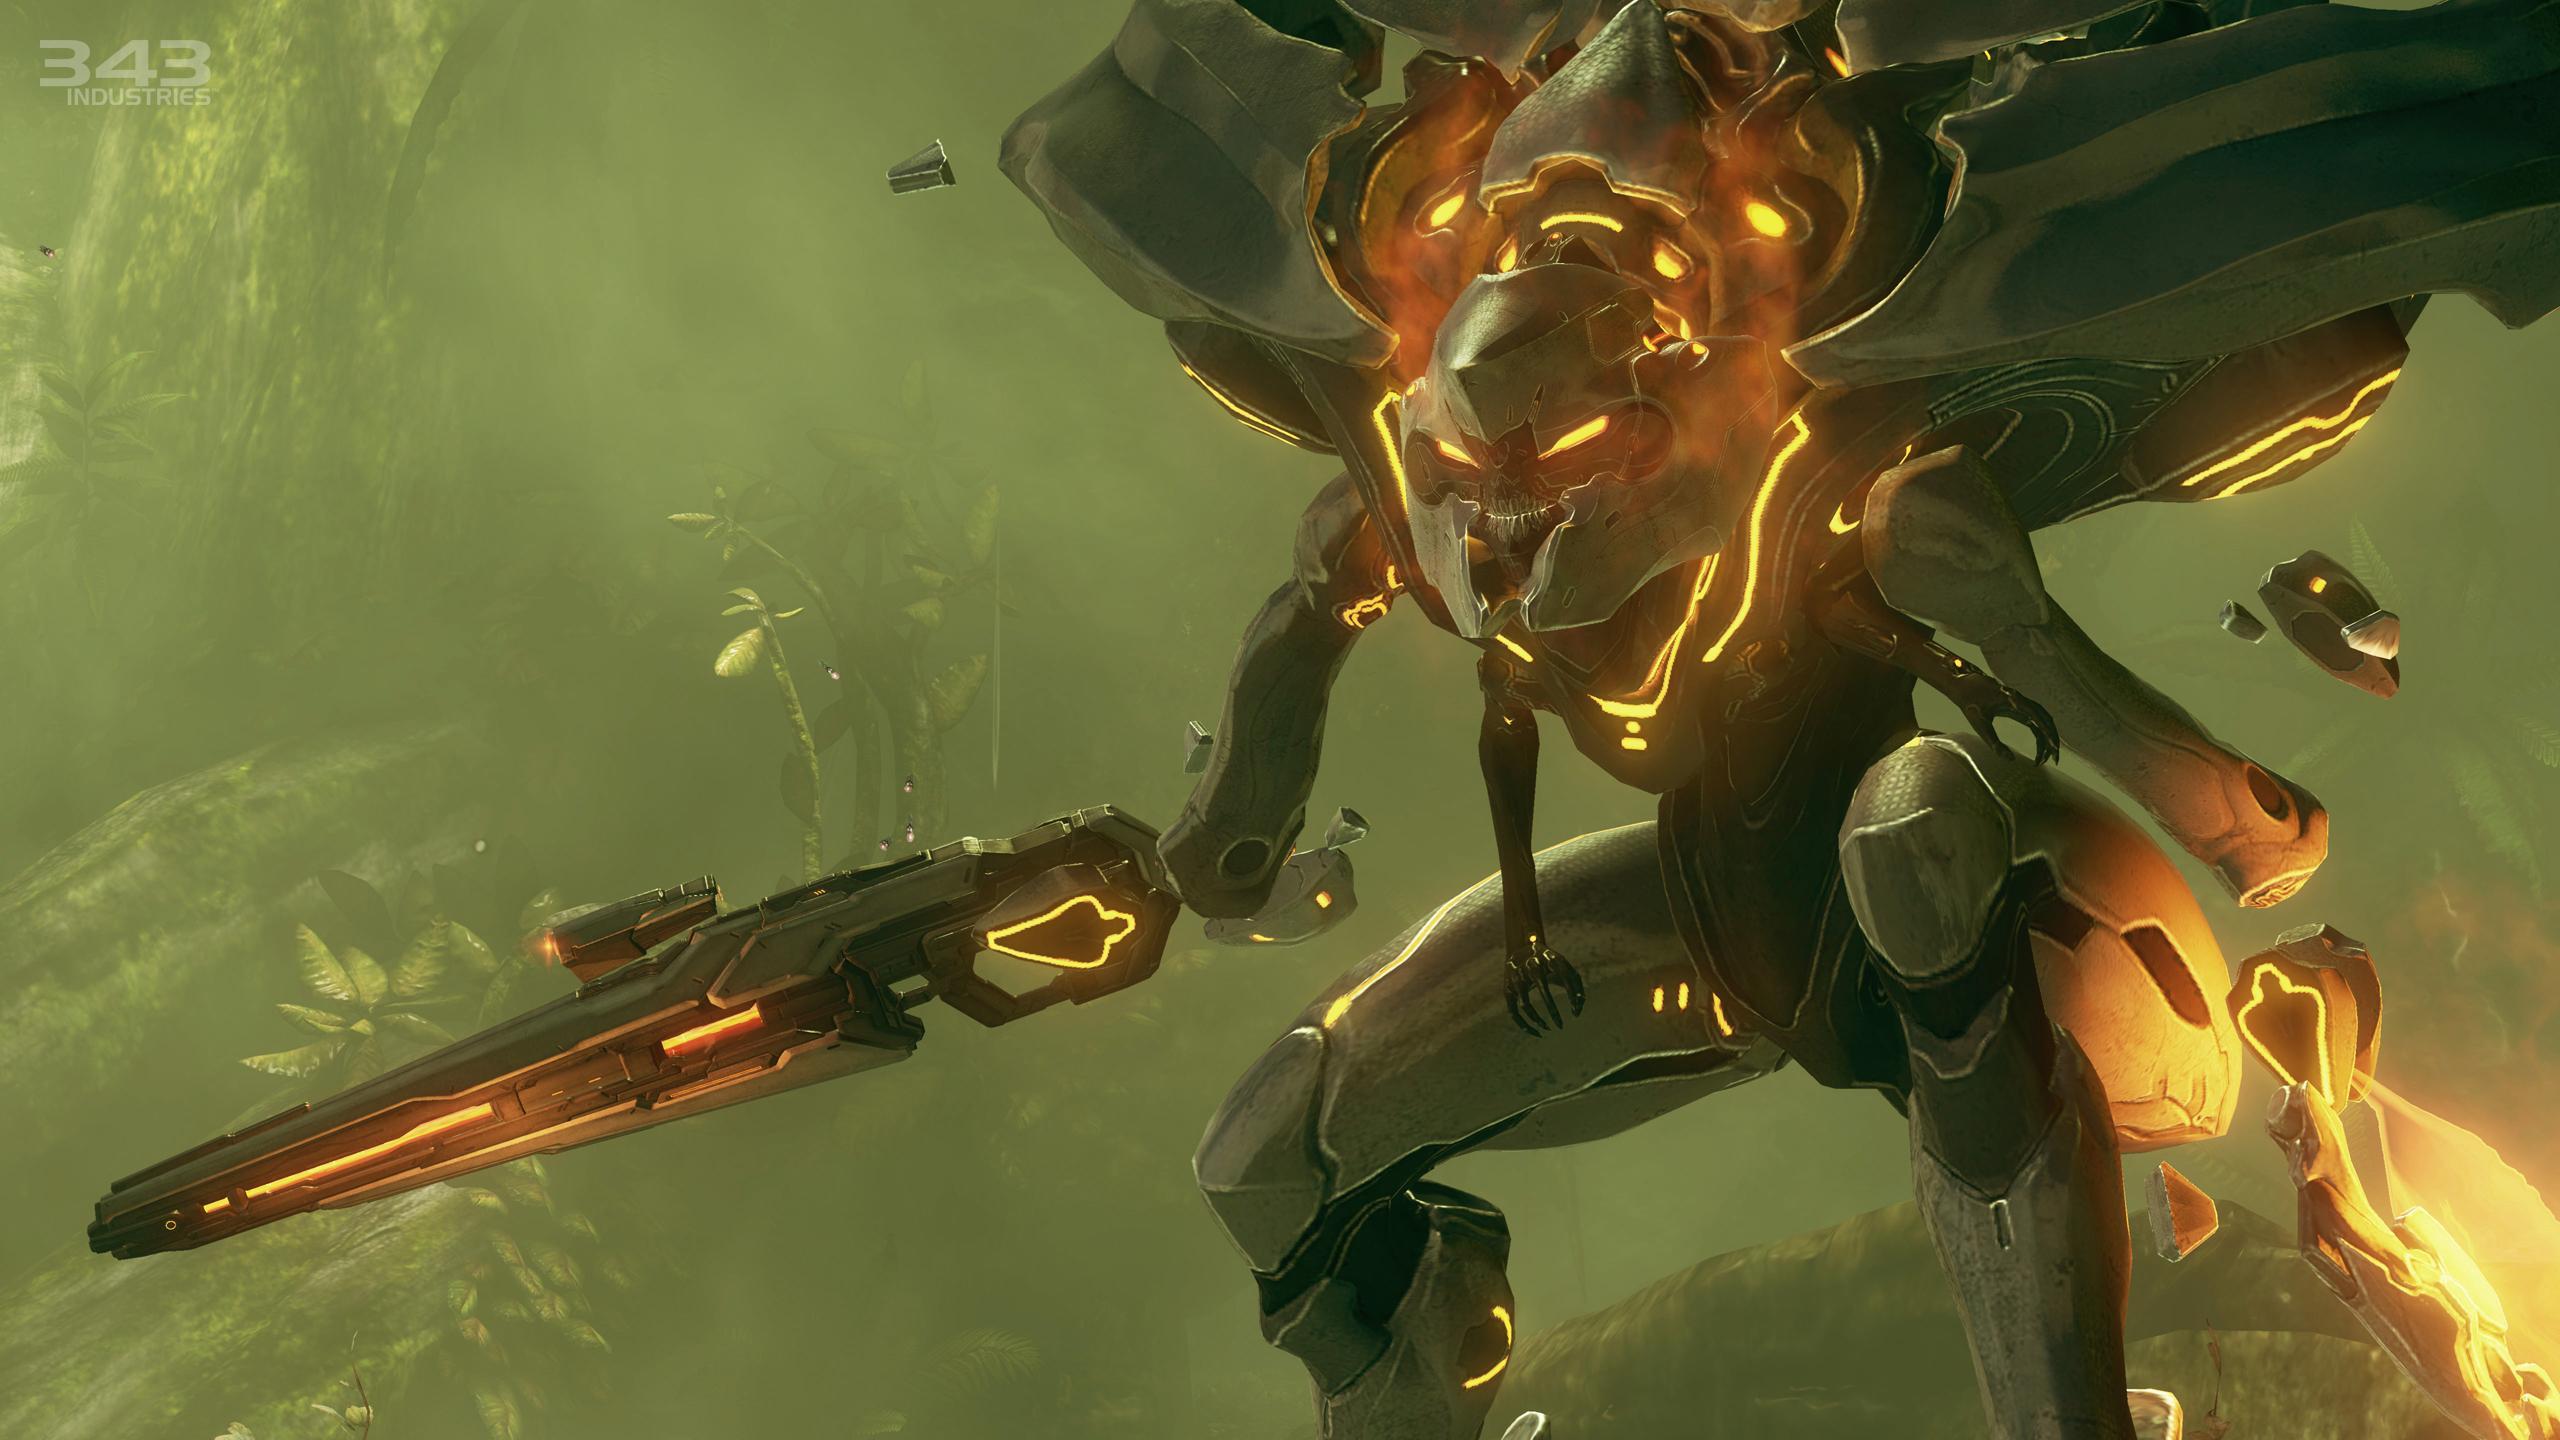 Halo 4 Wallpaper 4 2560x1440